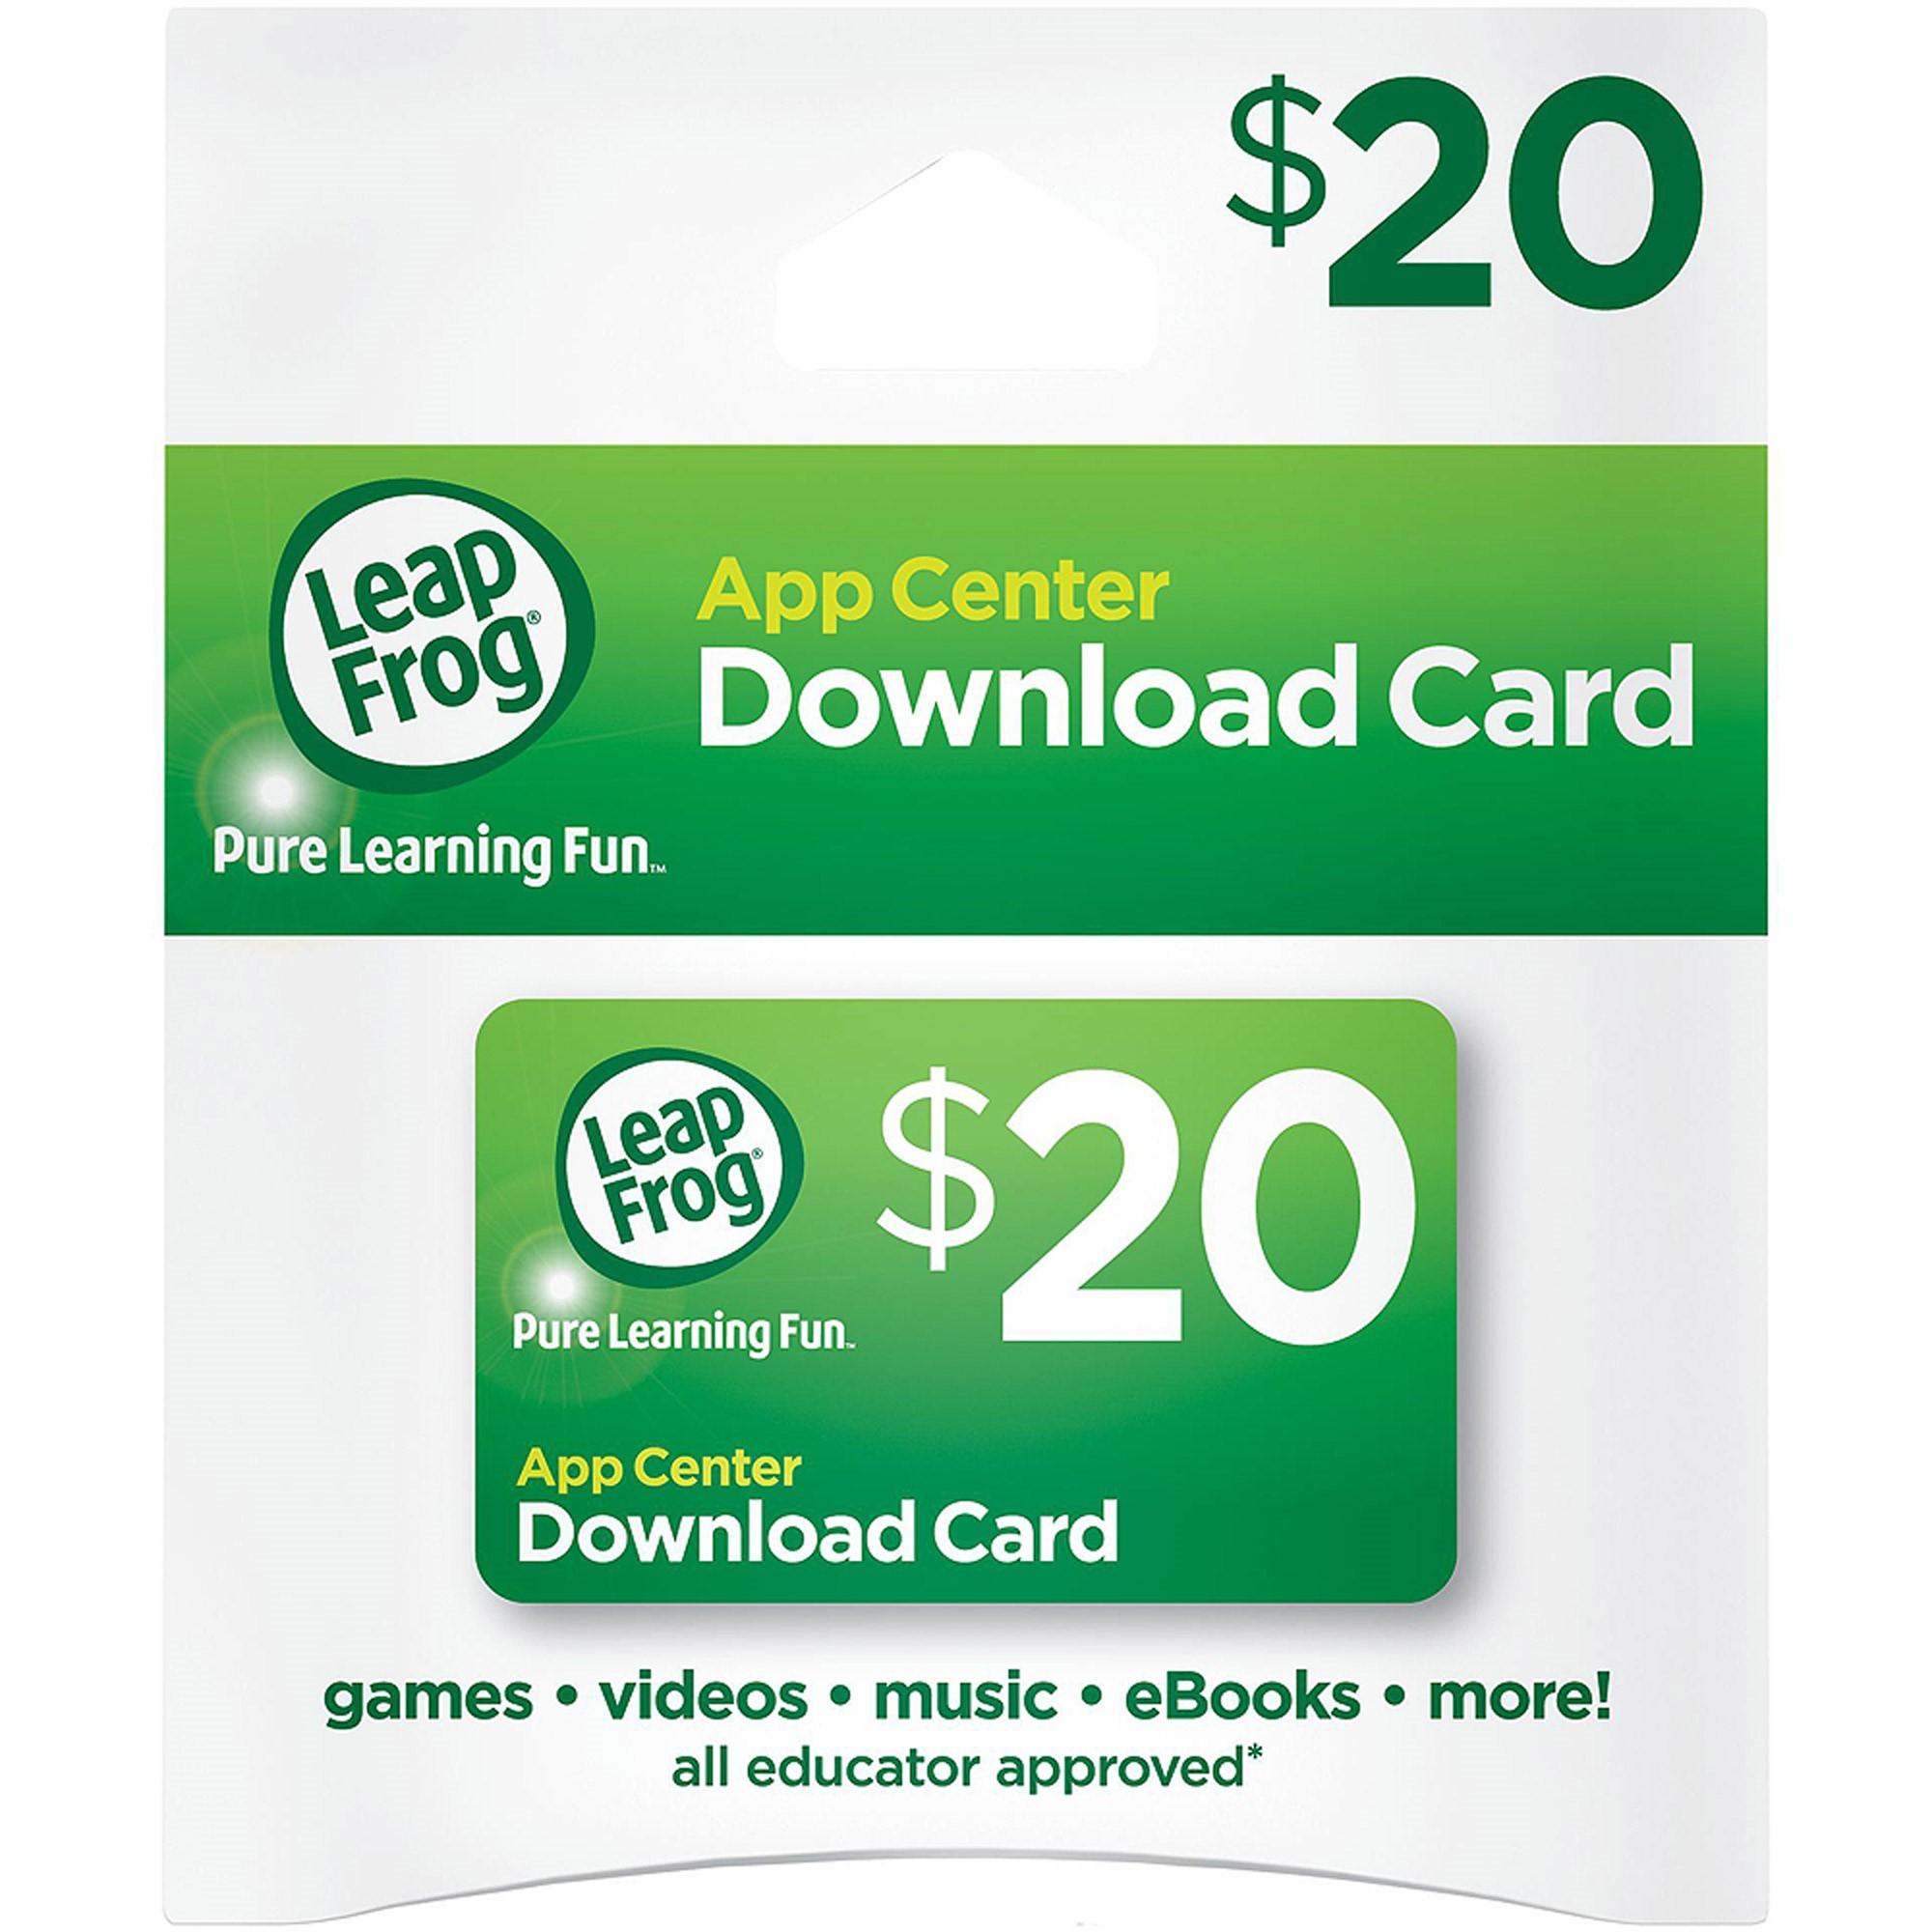 Leapfrog - Leapfrog App Center Download Card - Multicolor